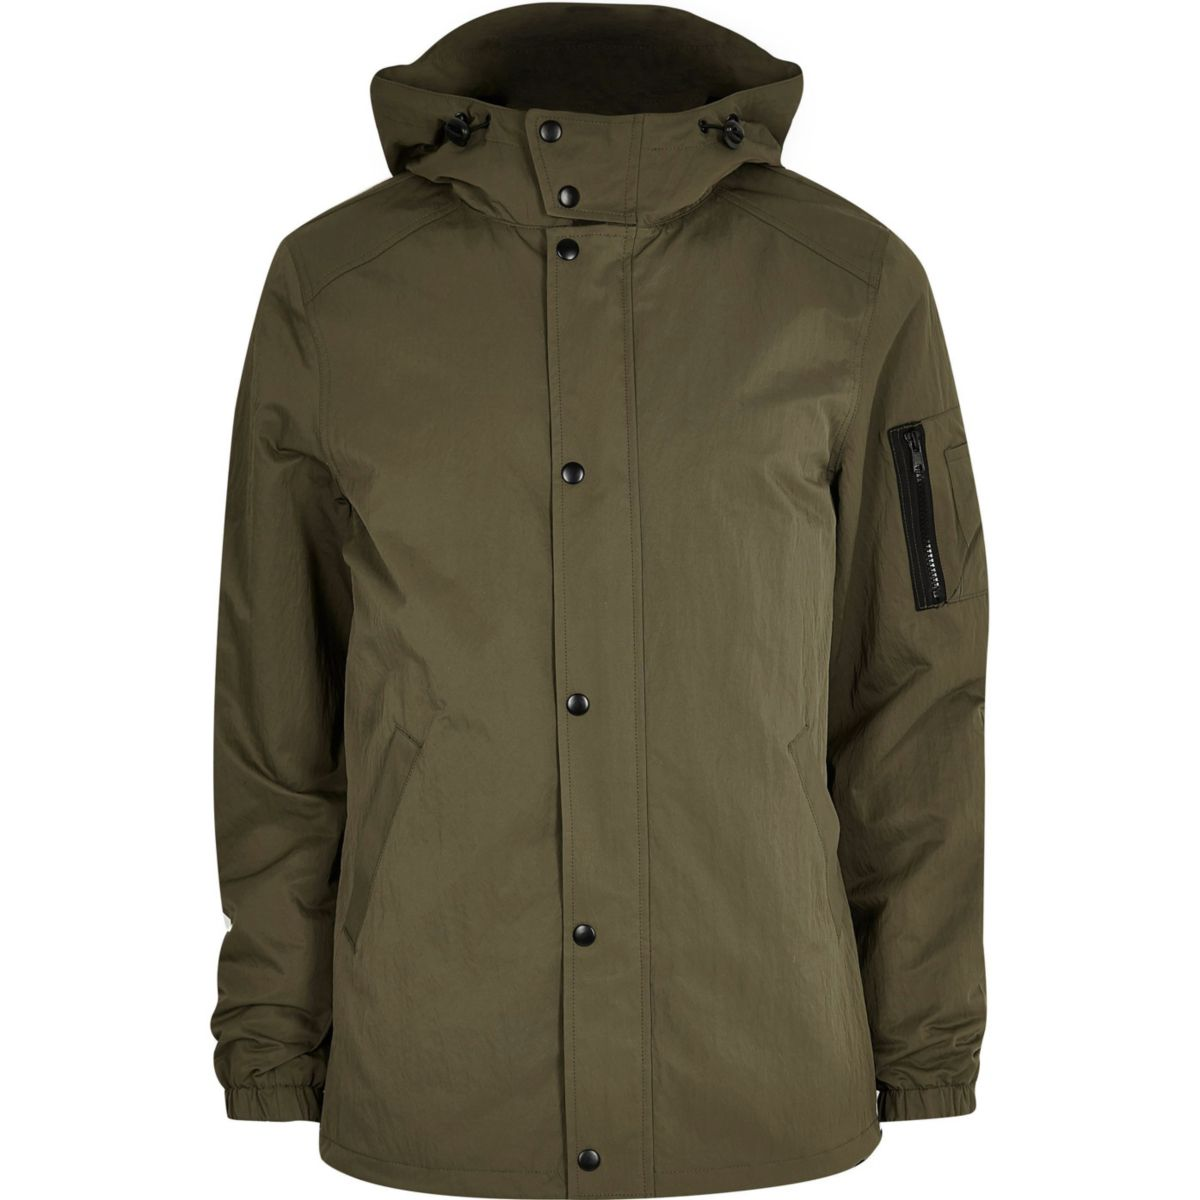 Big and Tall khaki green hooded jacket